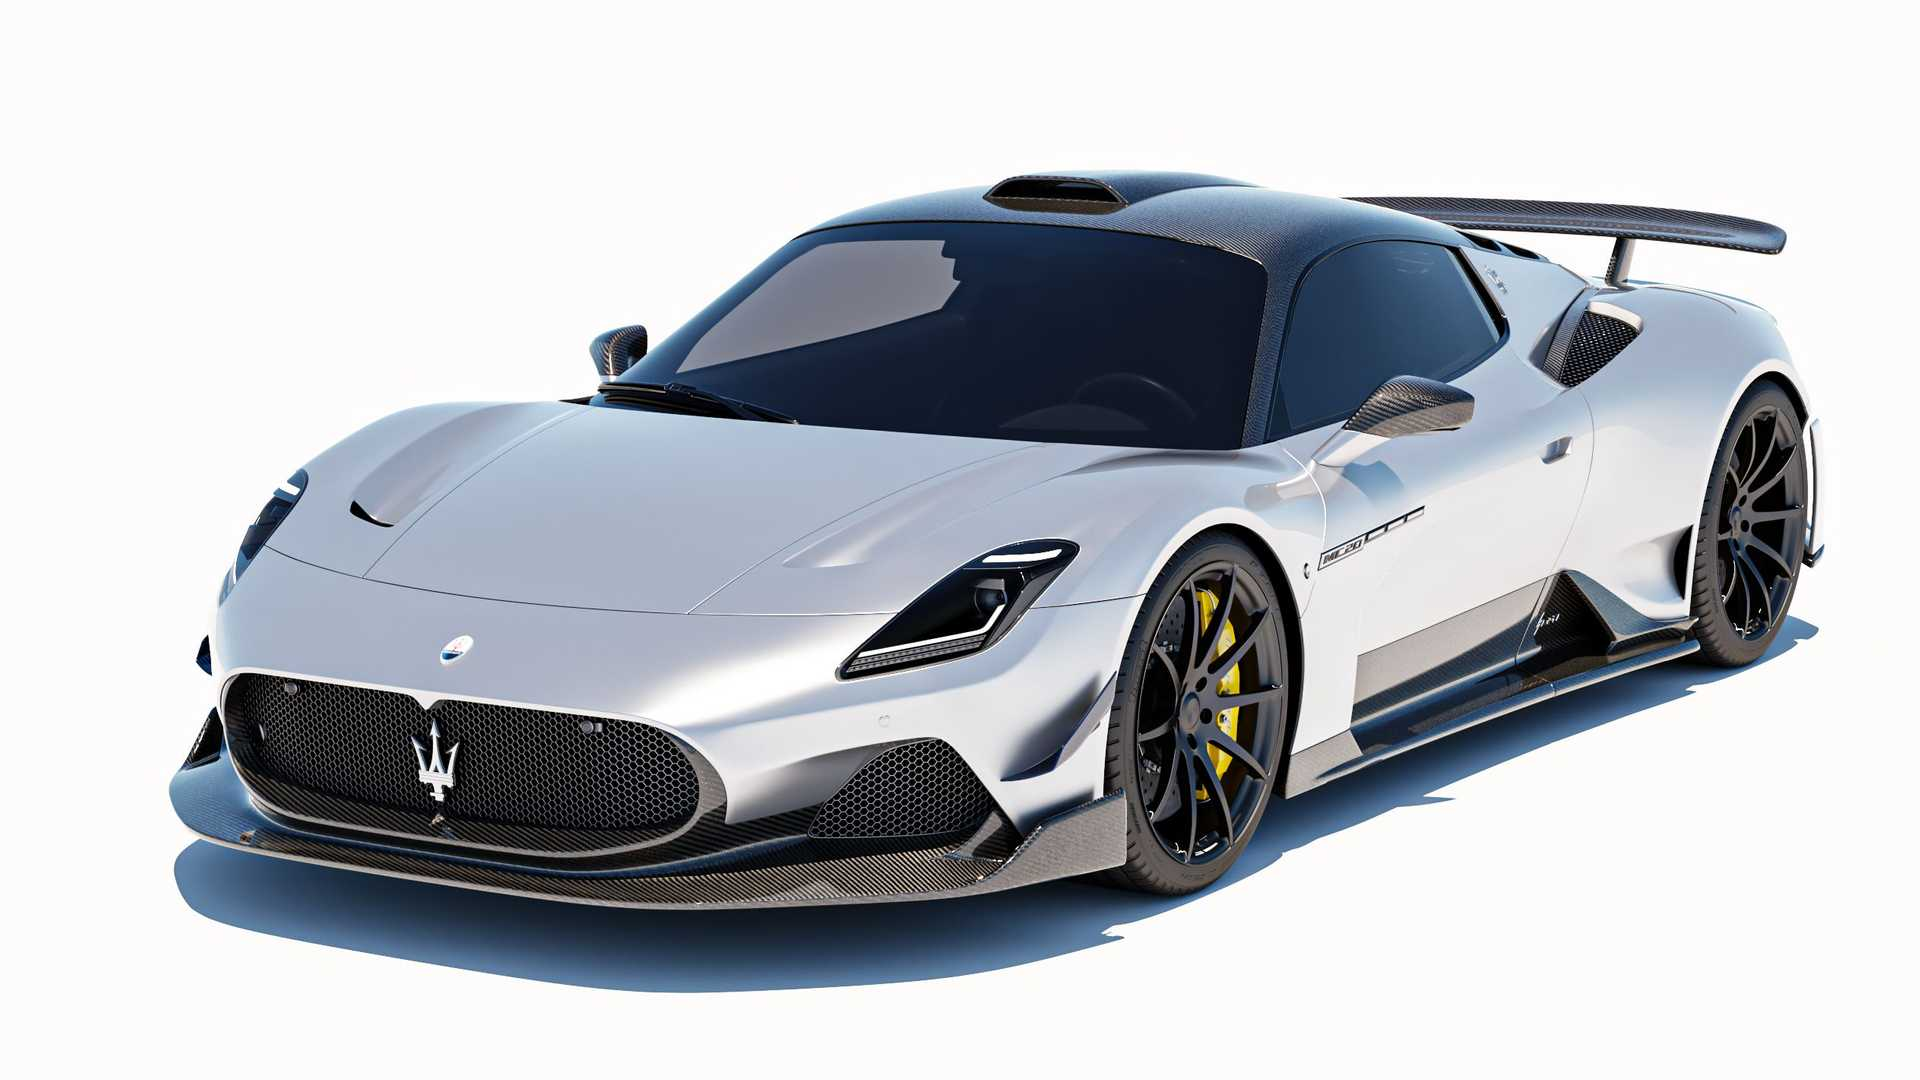 Maserati-MC20-bodykit-by-7-Designs-2